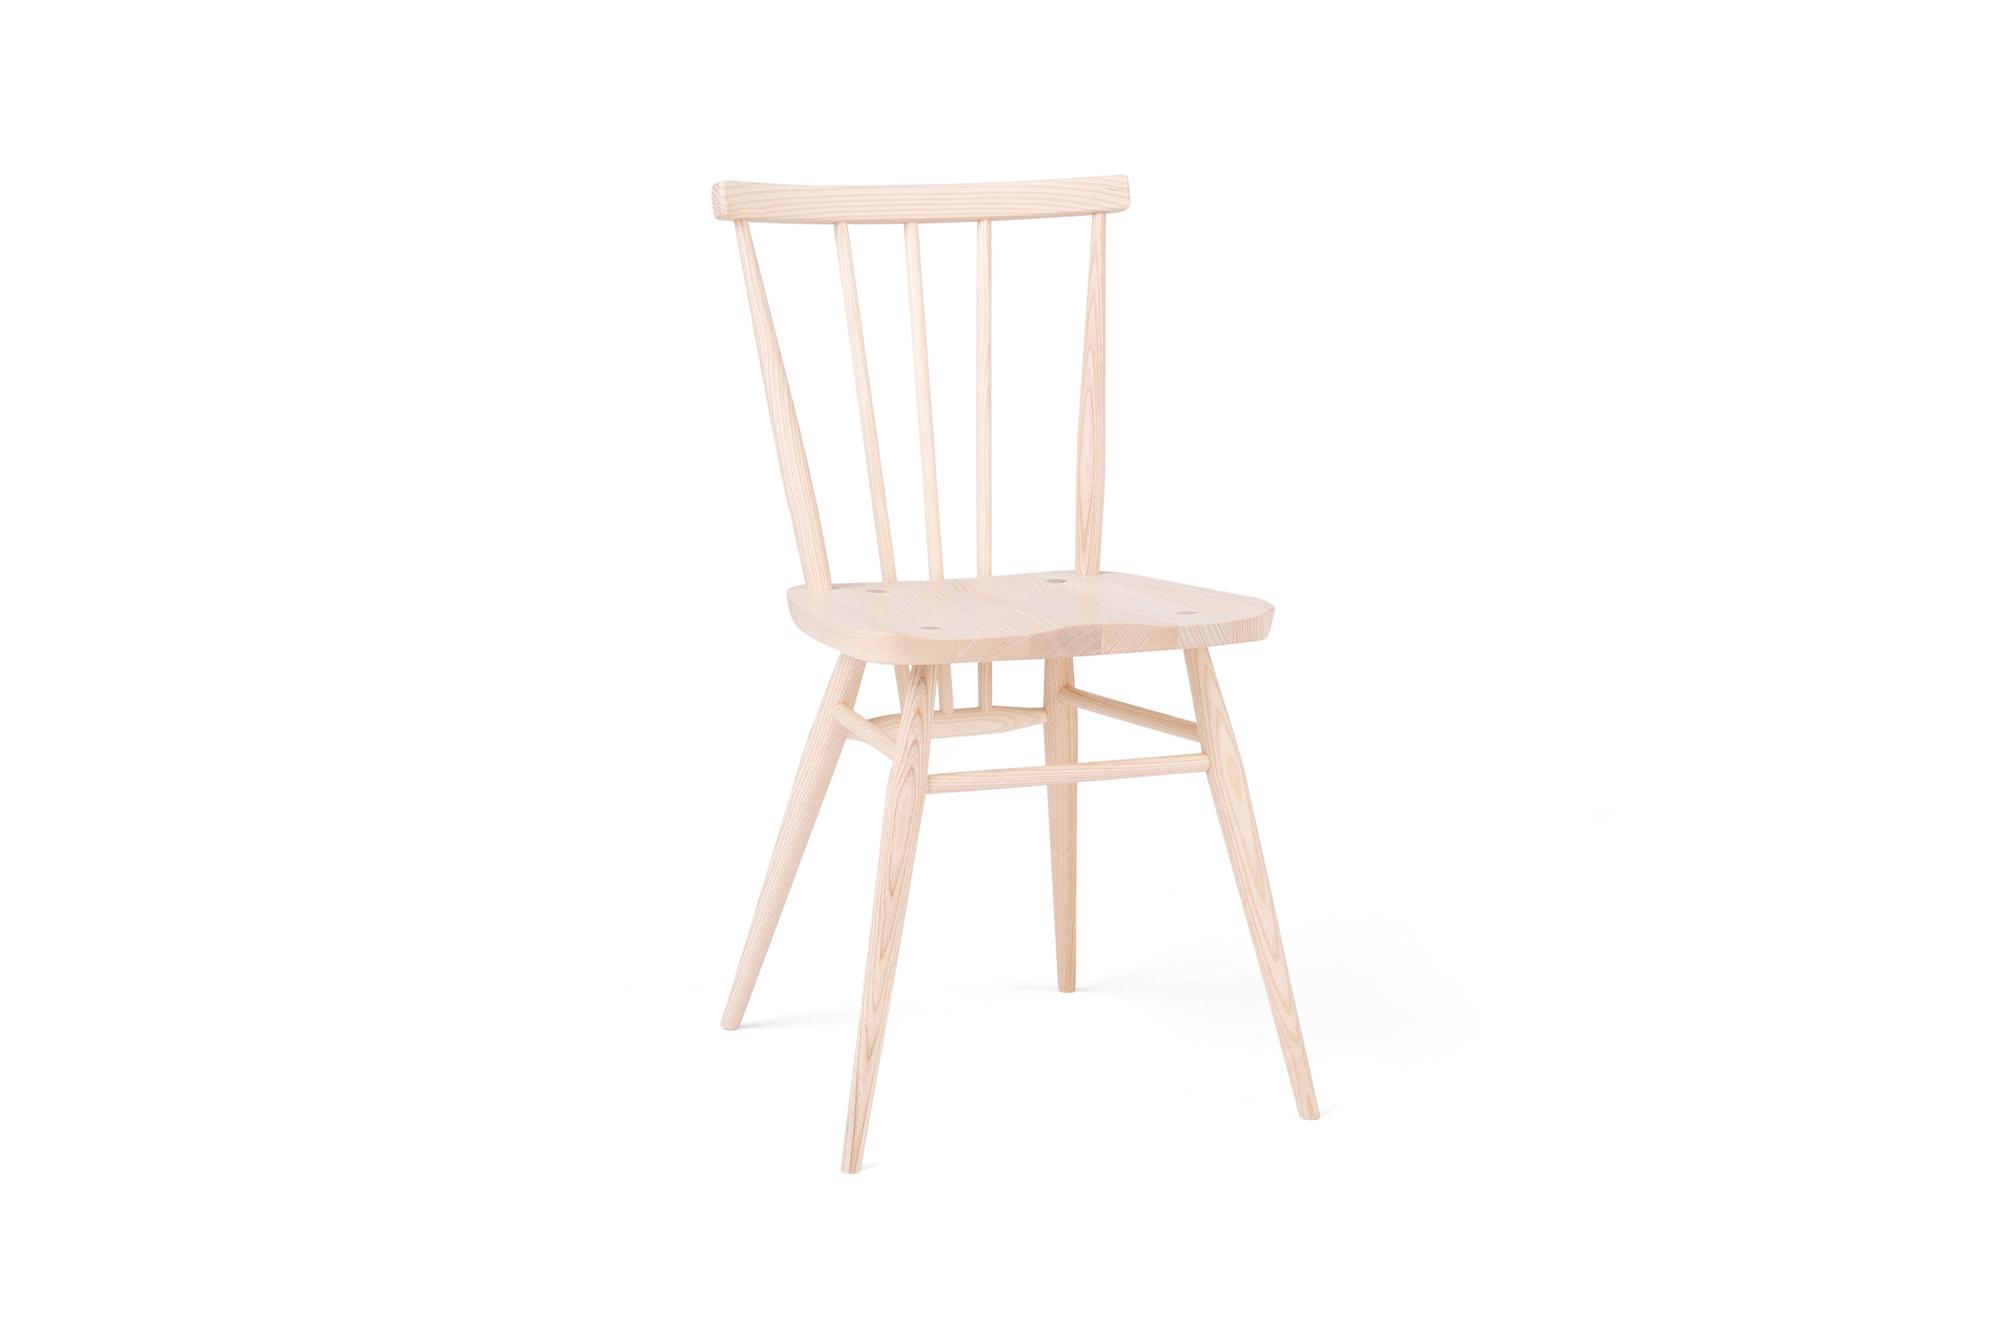 Originals All-Purpose Chair